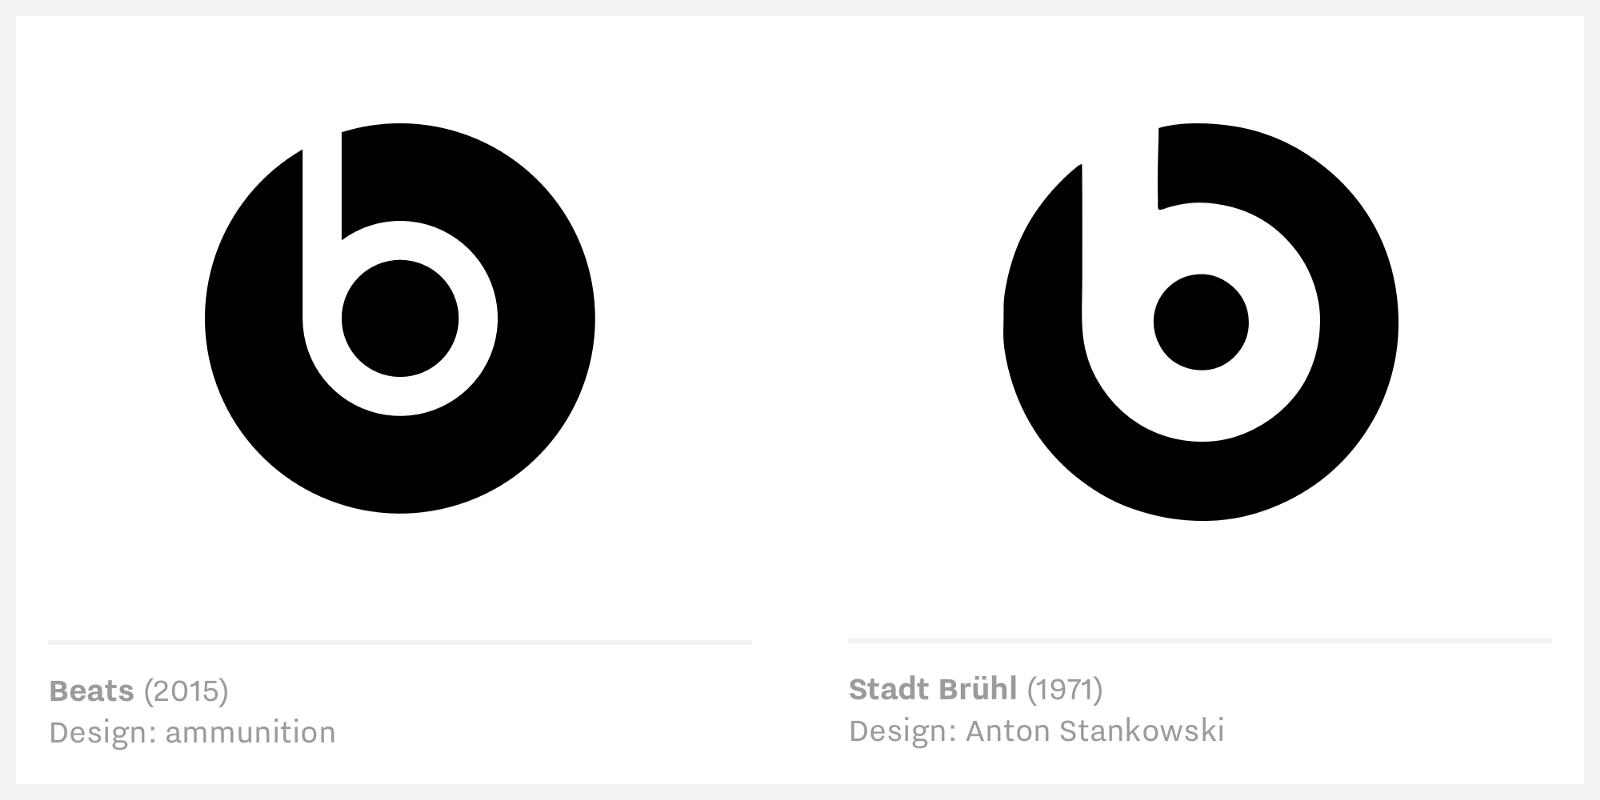 Google Image Result For Https Cdn Images 1 Medium Com Max 1600 1 Mdgkgmxiwn4fgnrvj7wa G Png Logos Popular Logos Logo Concept